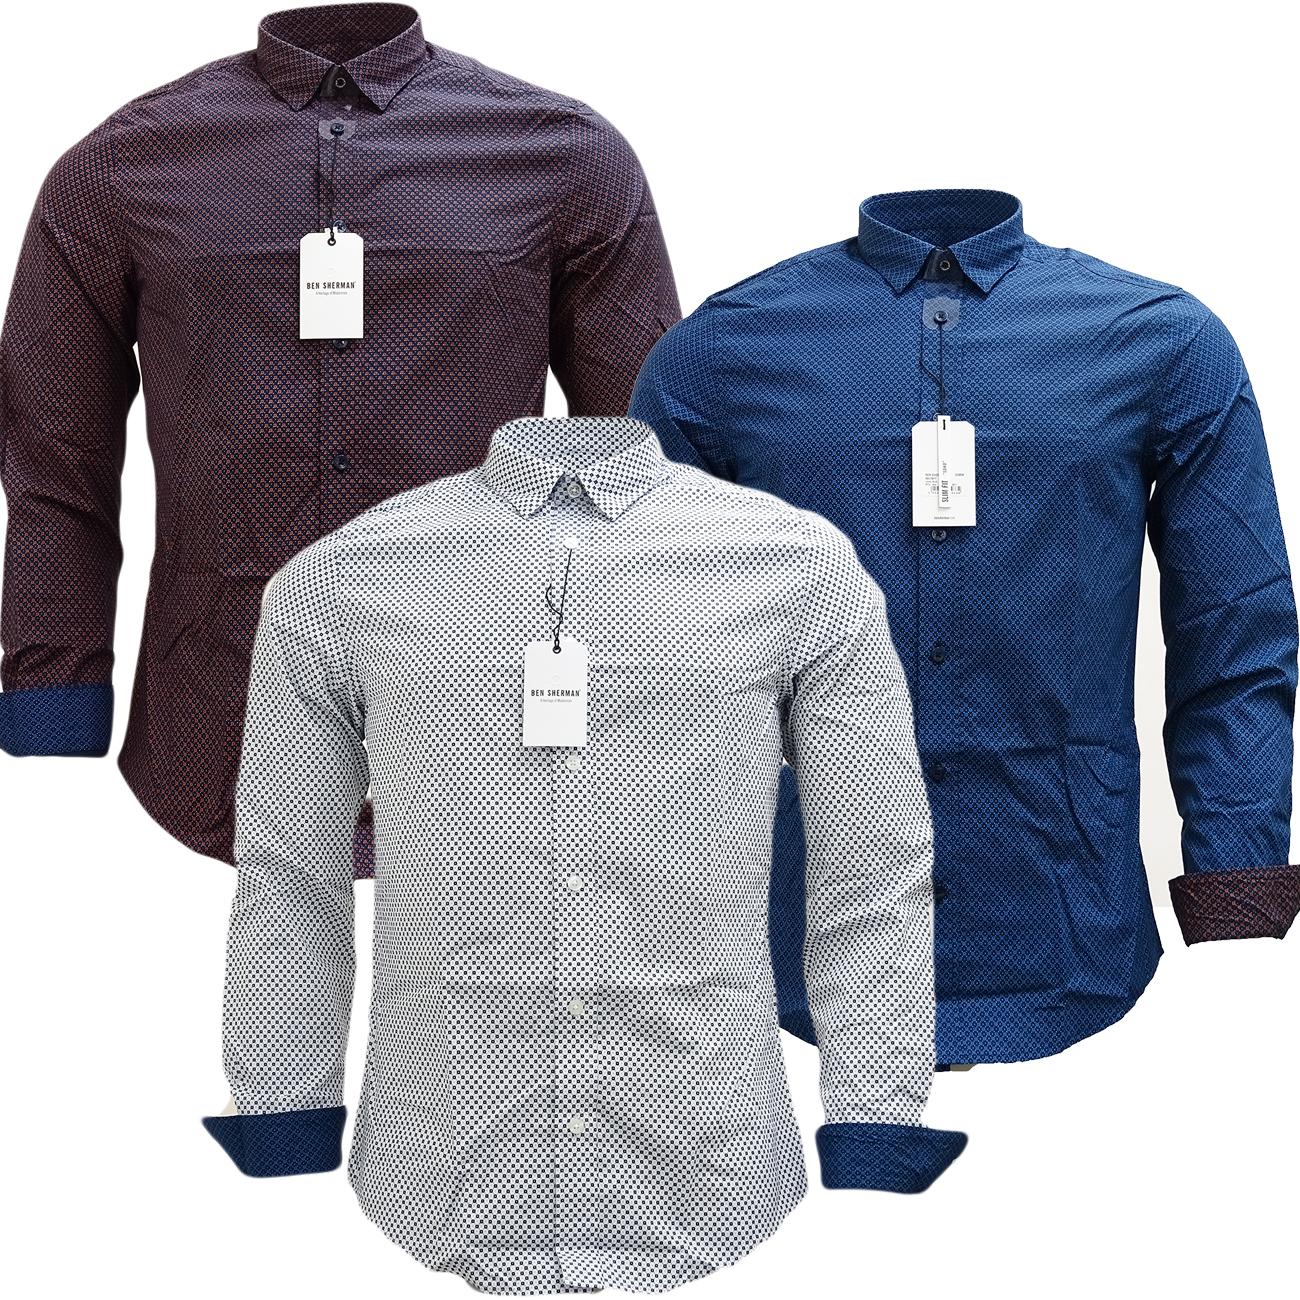 5e87614bf5 Sentinel Ben Sherman Shirt - MA12977